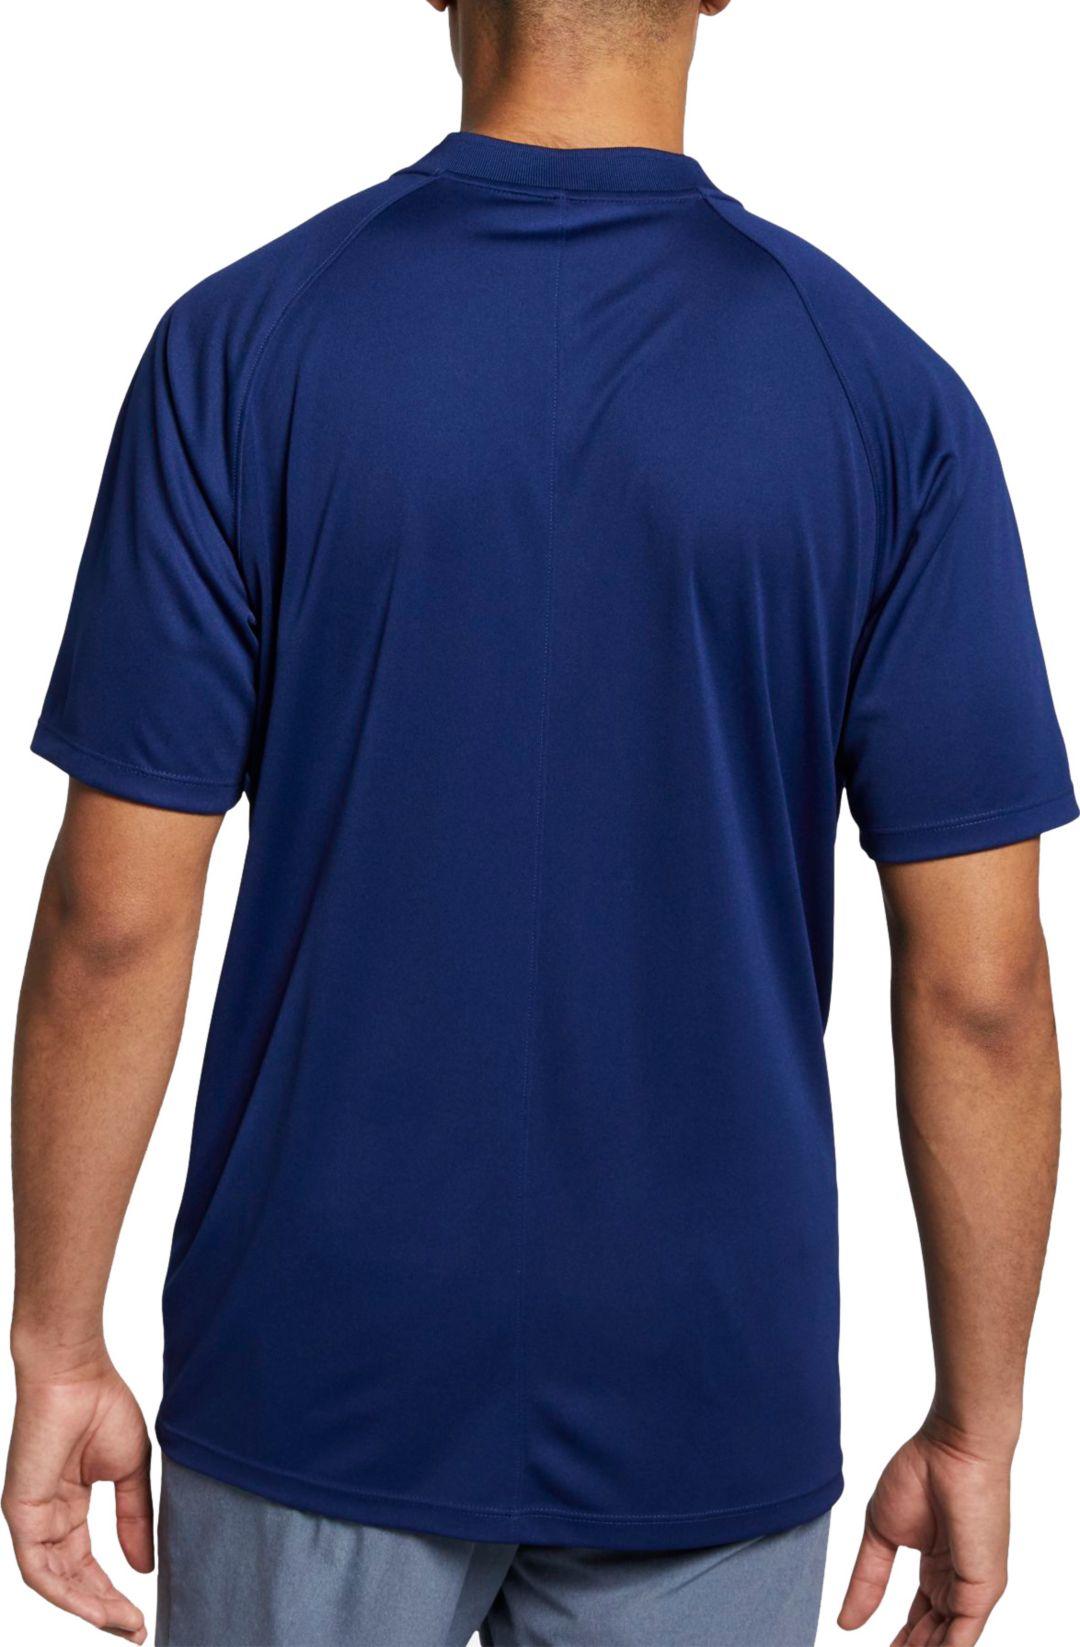 8ecfbd4adab0 Nike Men s Dry Momentum Golf Polo 2